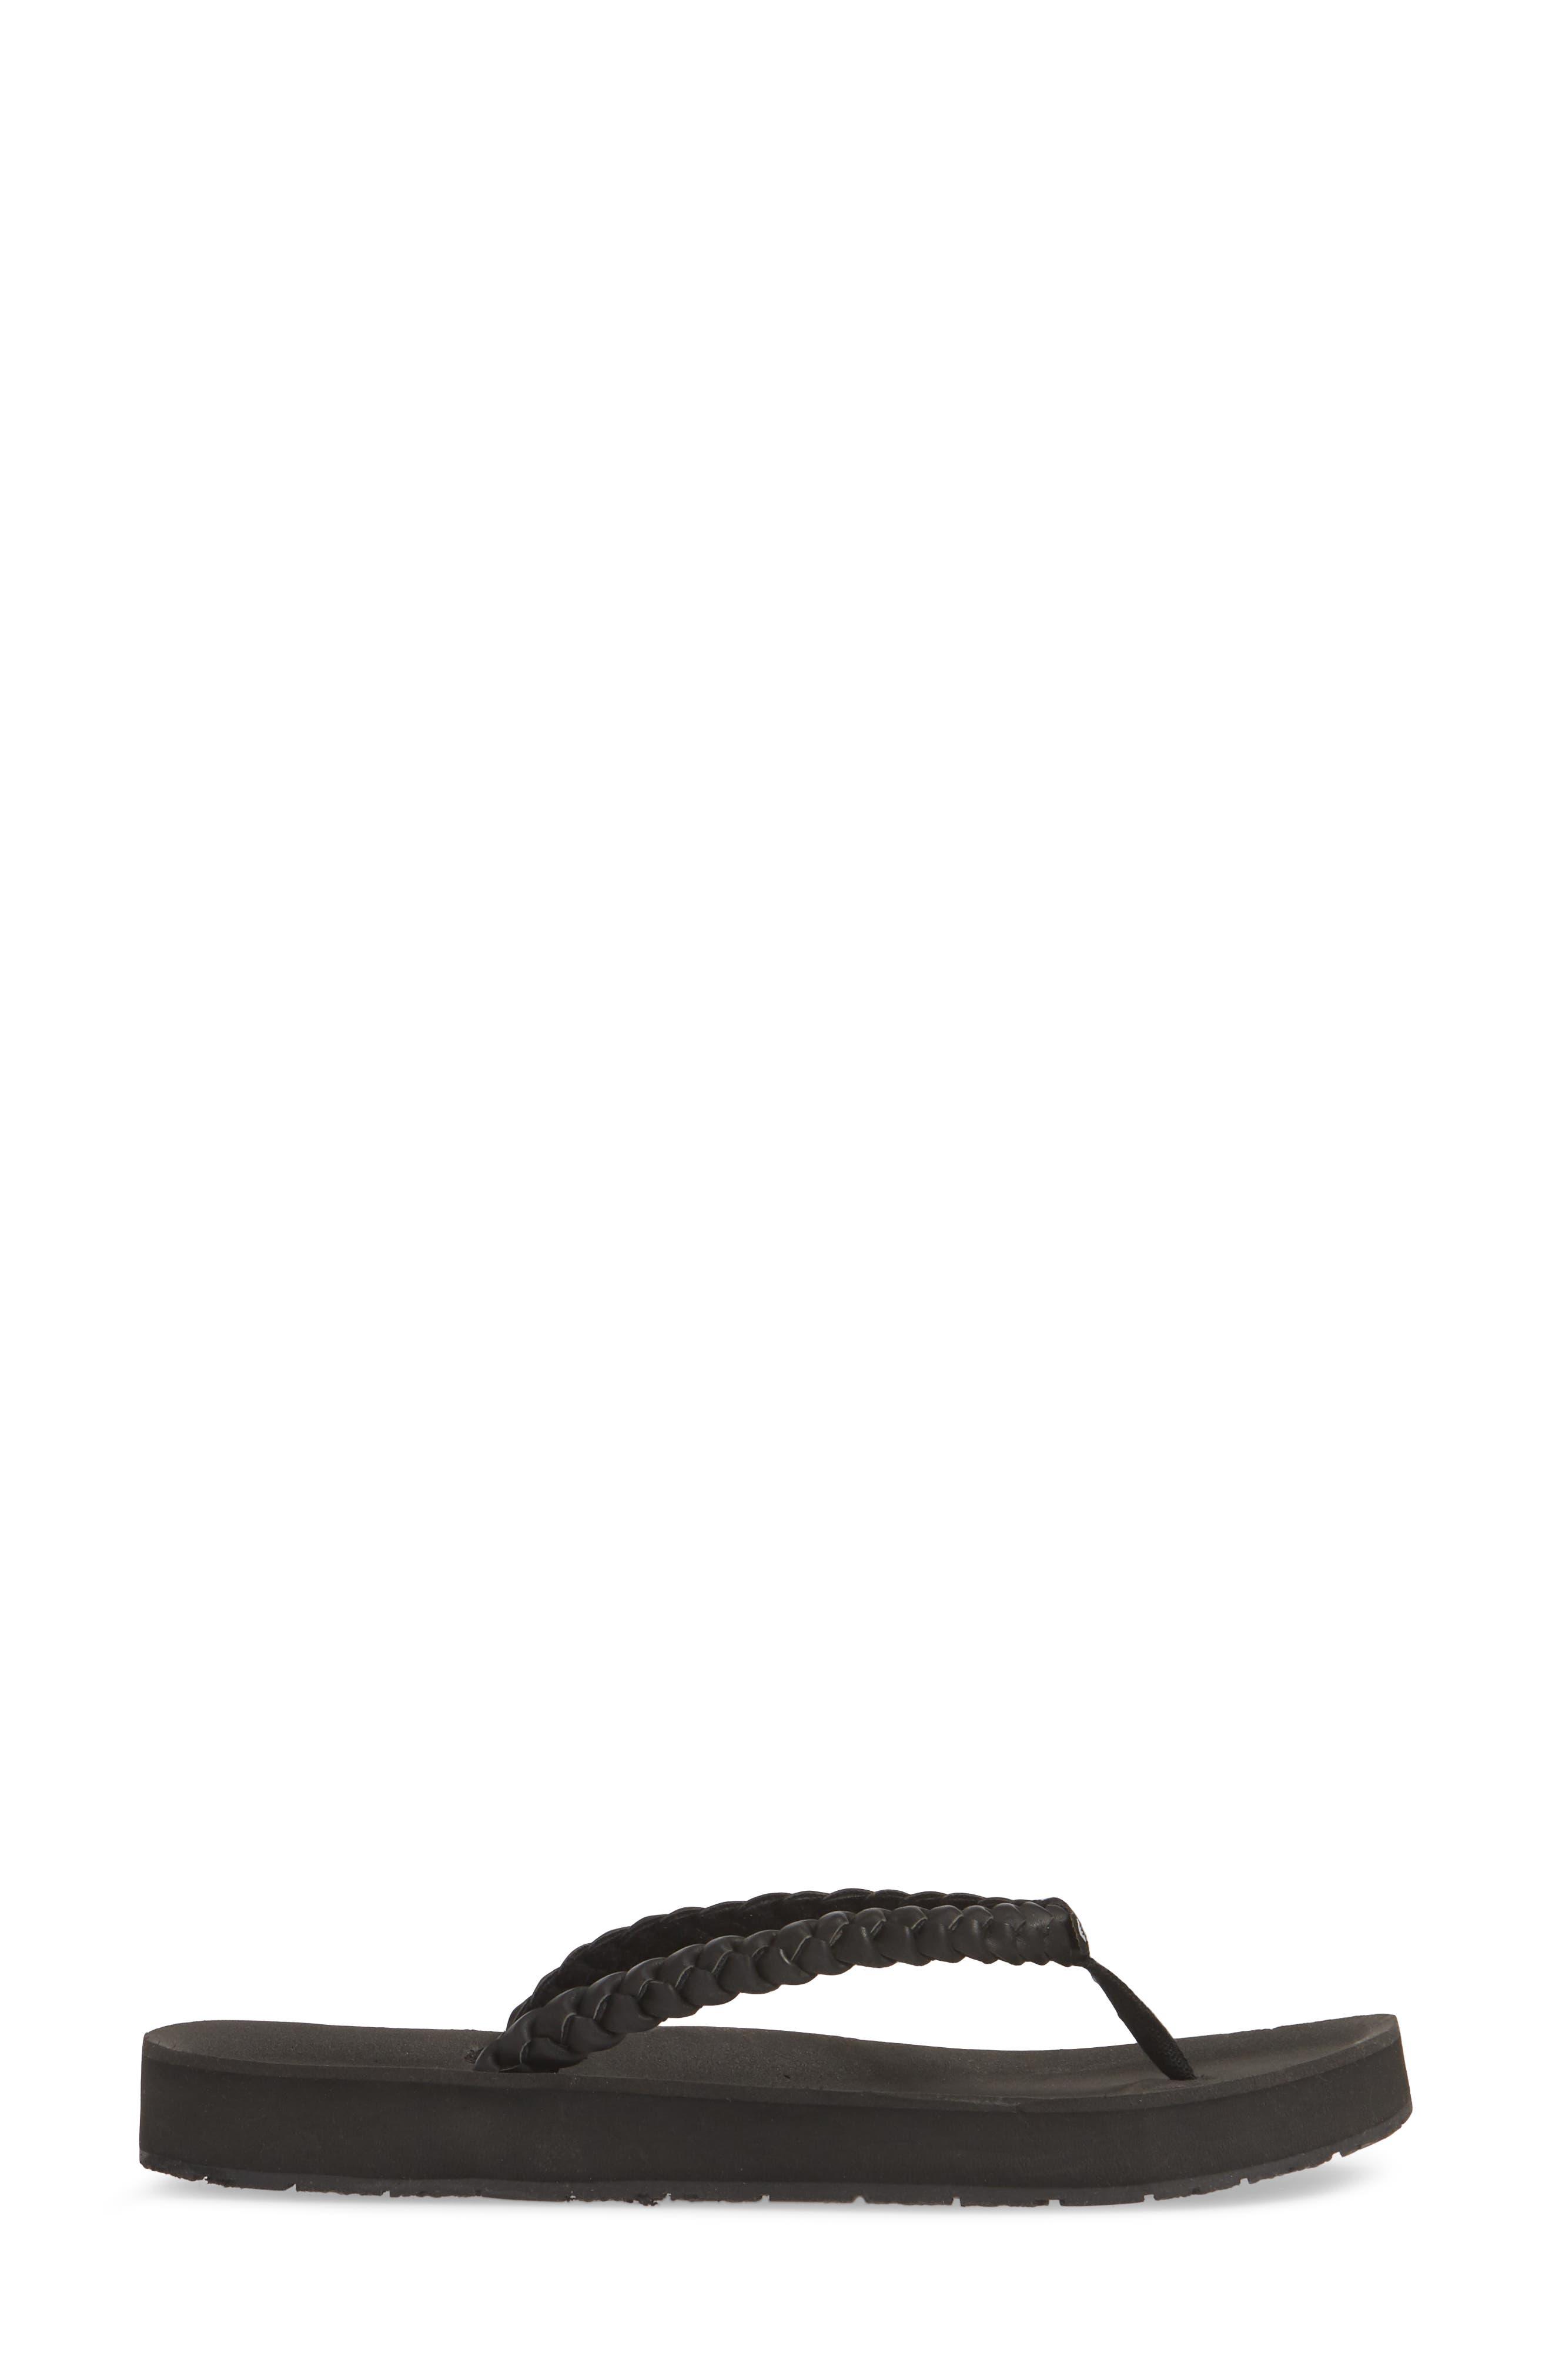 MINNETONKA, Hallie Flip Flop, Alternate thumbnail 3, color, BLACK